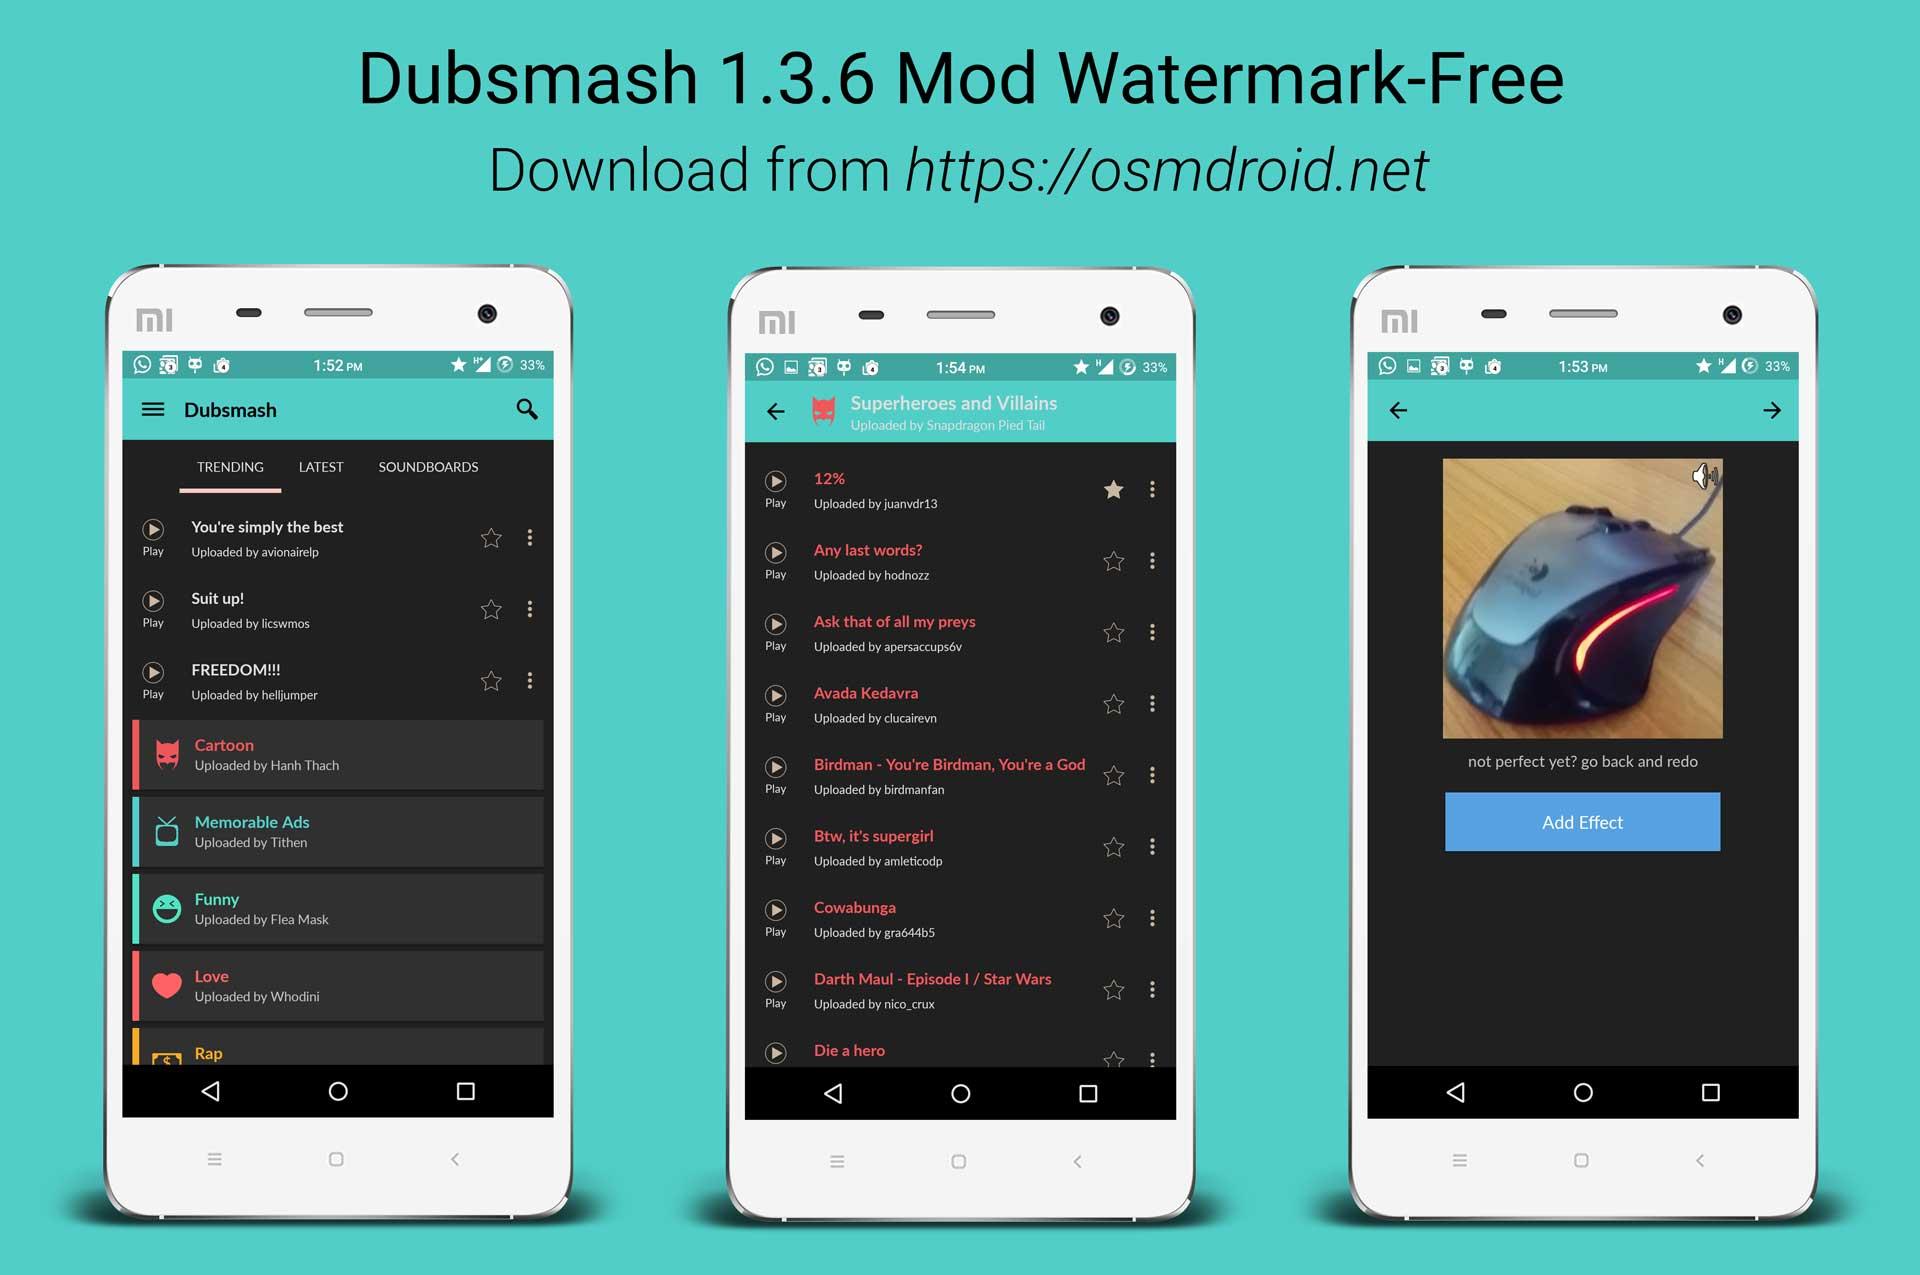 Dubsmash 1.3.6 Mod Watermark Free